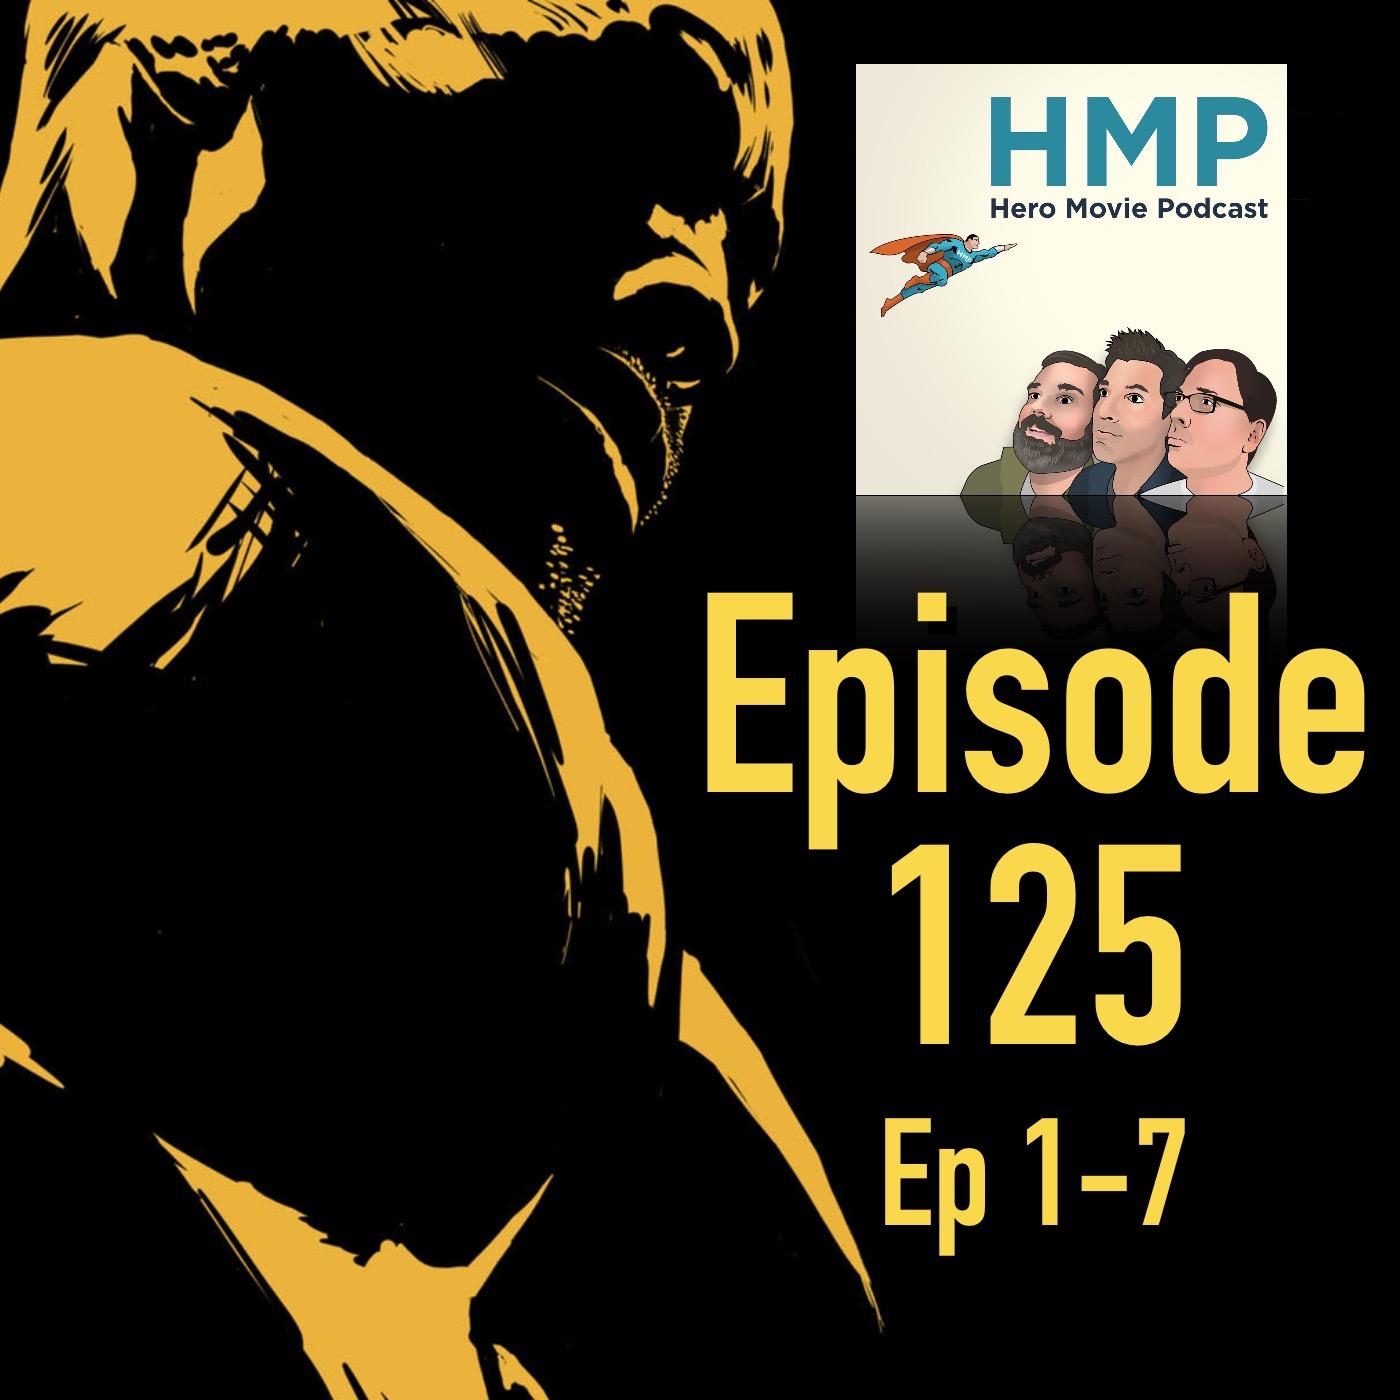 Episode 125- Luke Cage Season 1, Ep 1-7